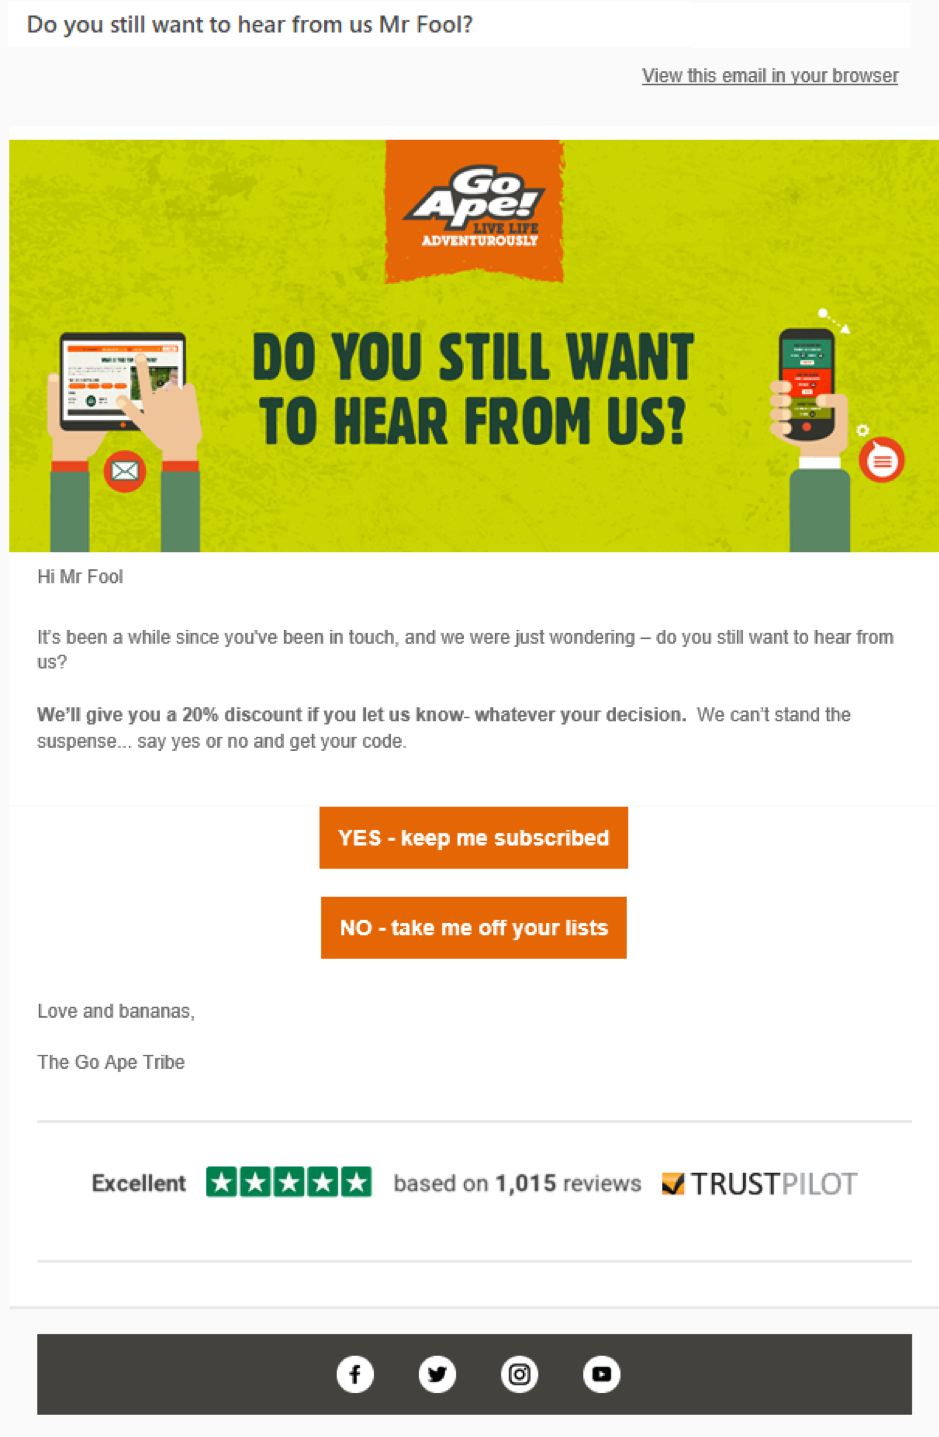 Go Ape email di marketing